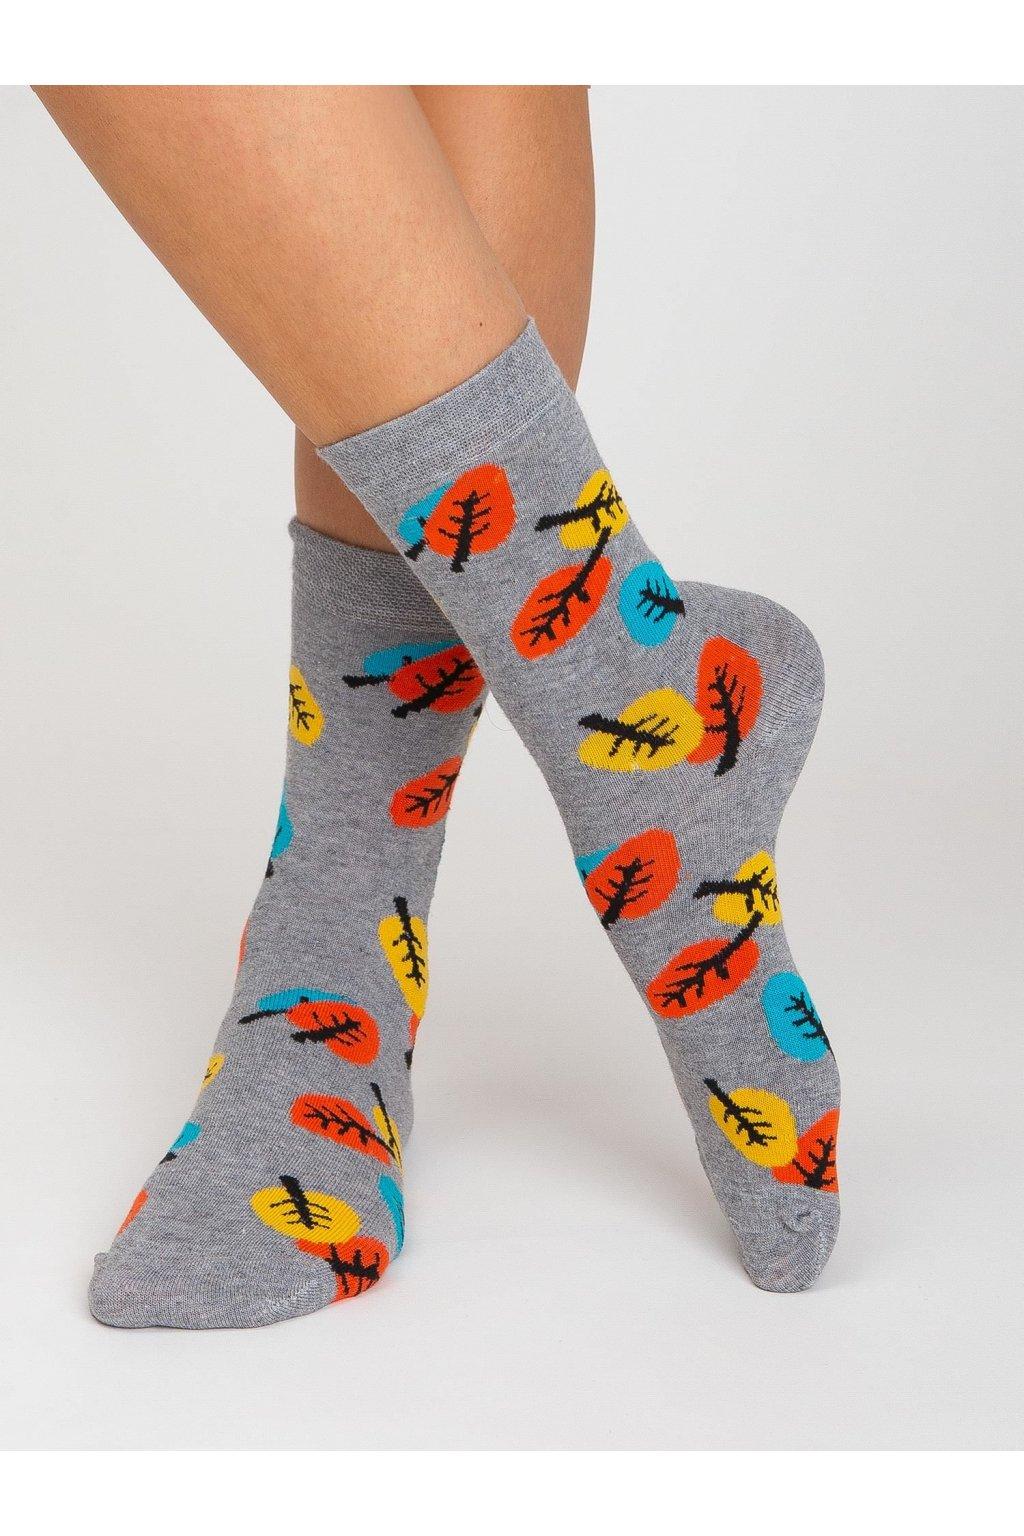 Dámske ponožky kód WS-SR-5621